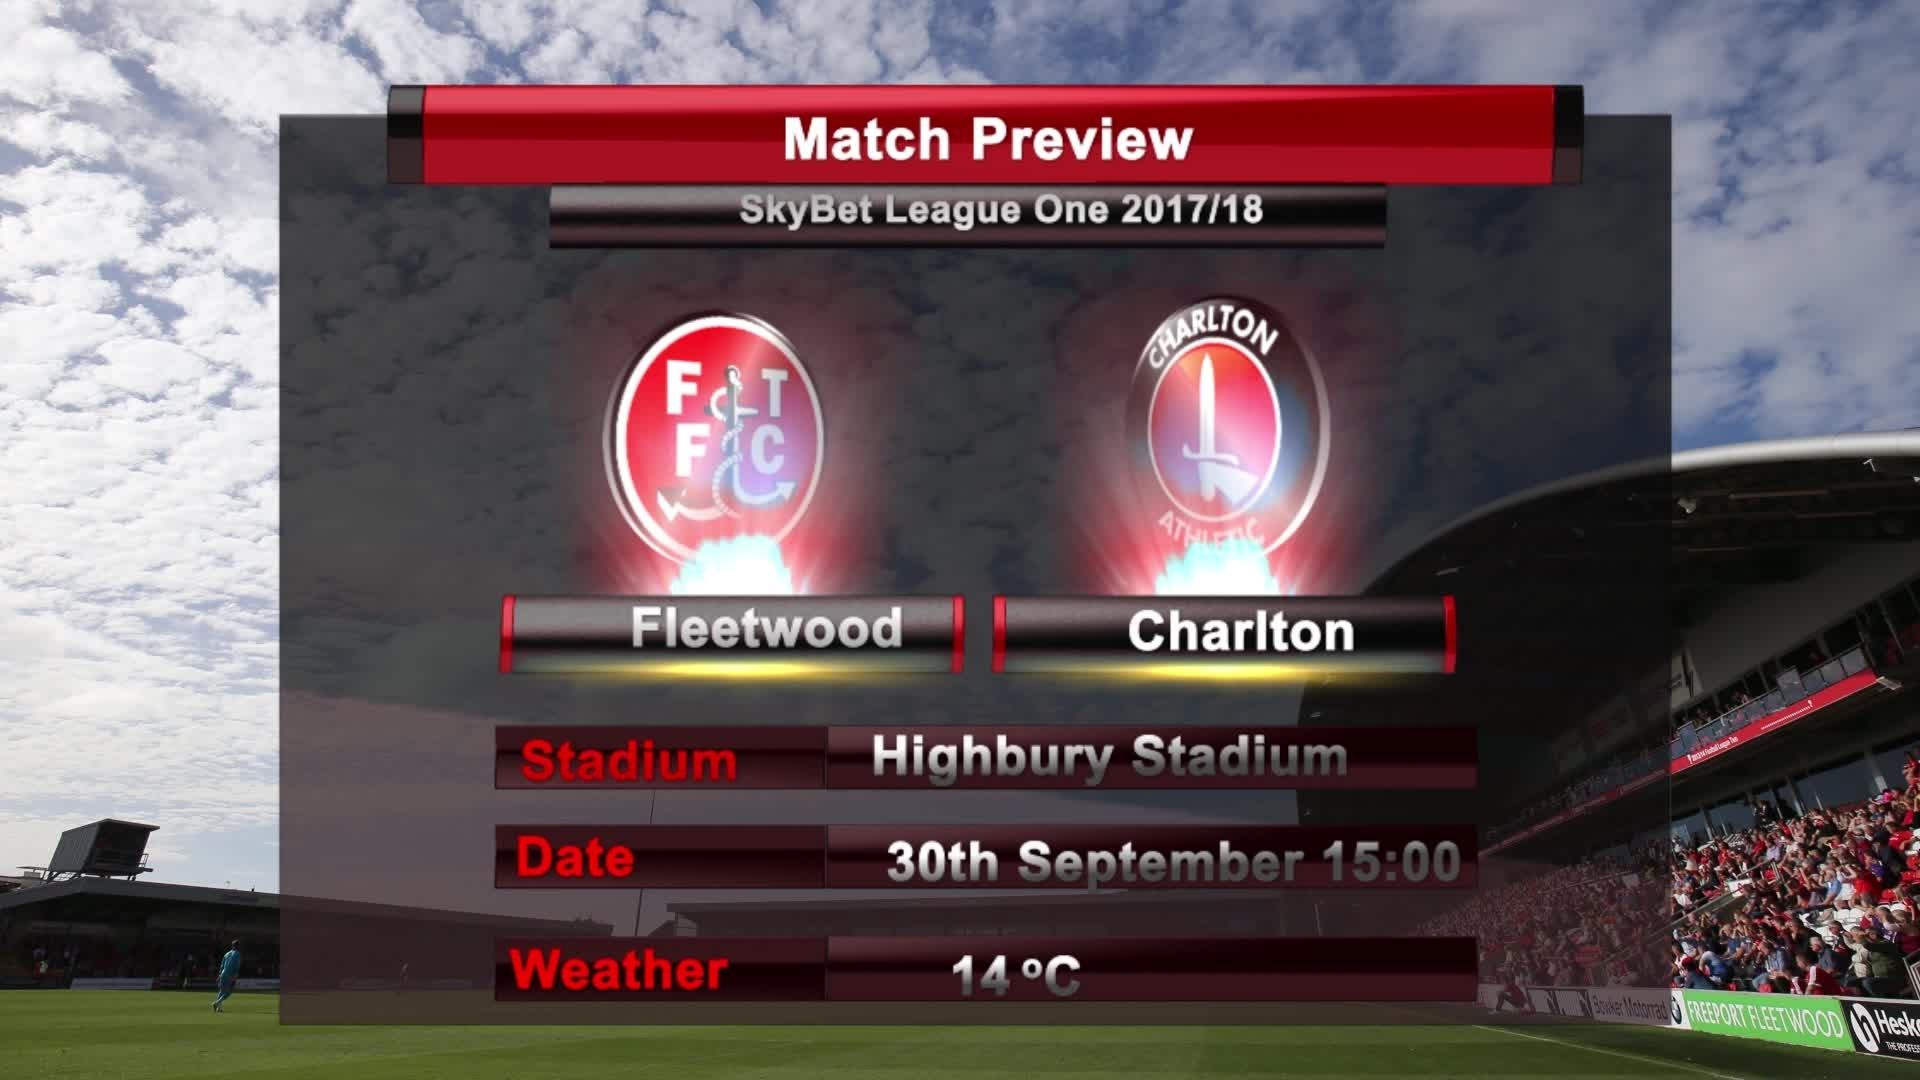 MATCH PREVIEW | Fleetwood vs Charlton